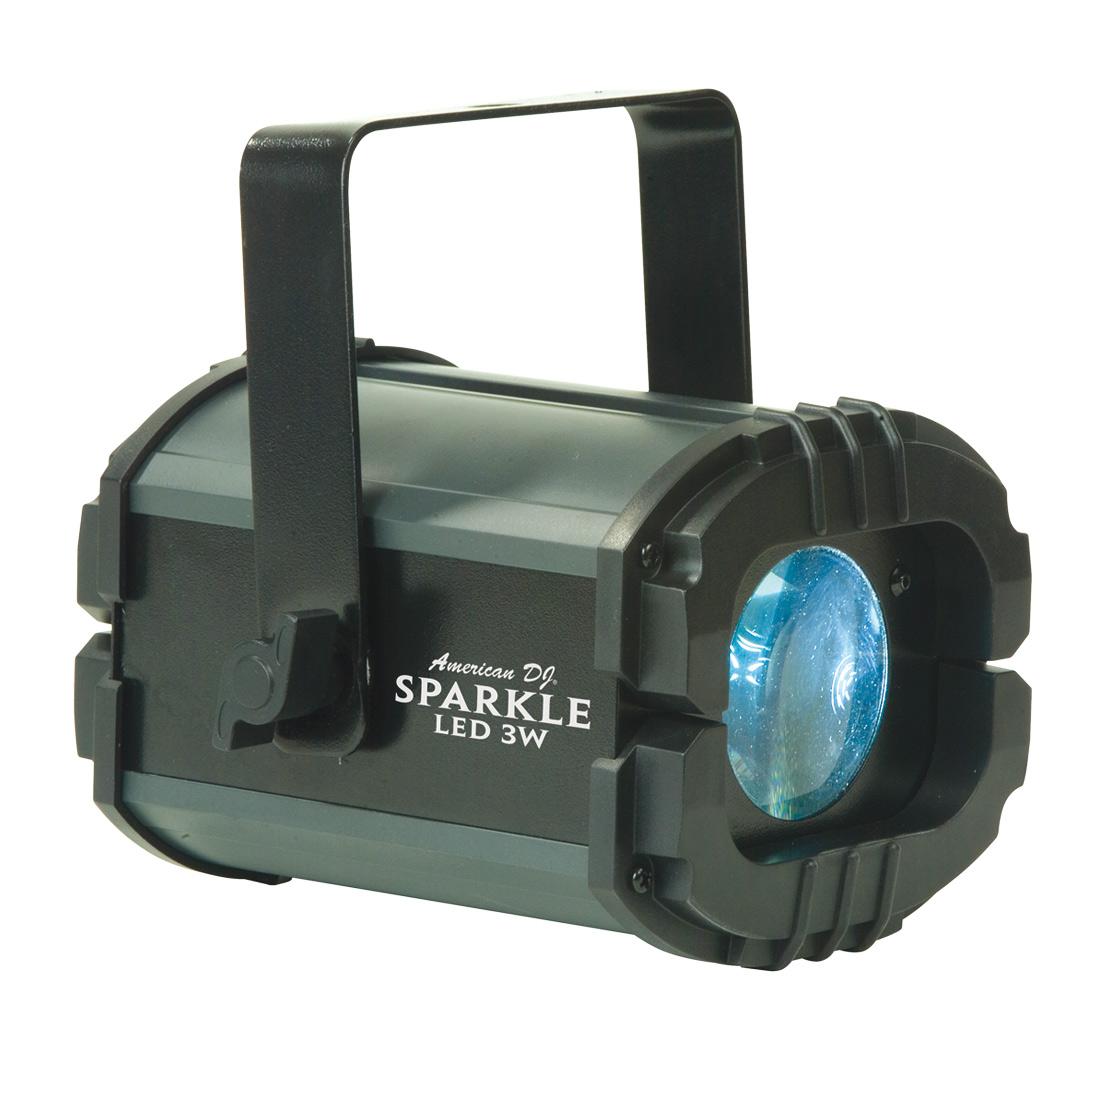 Sparkle LED 3W